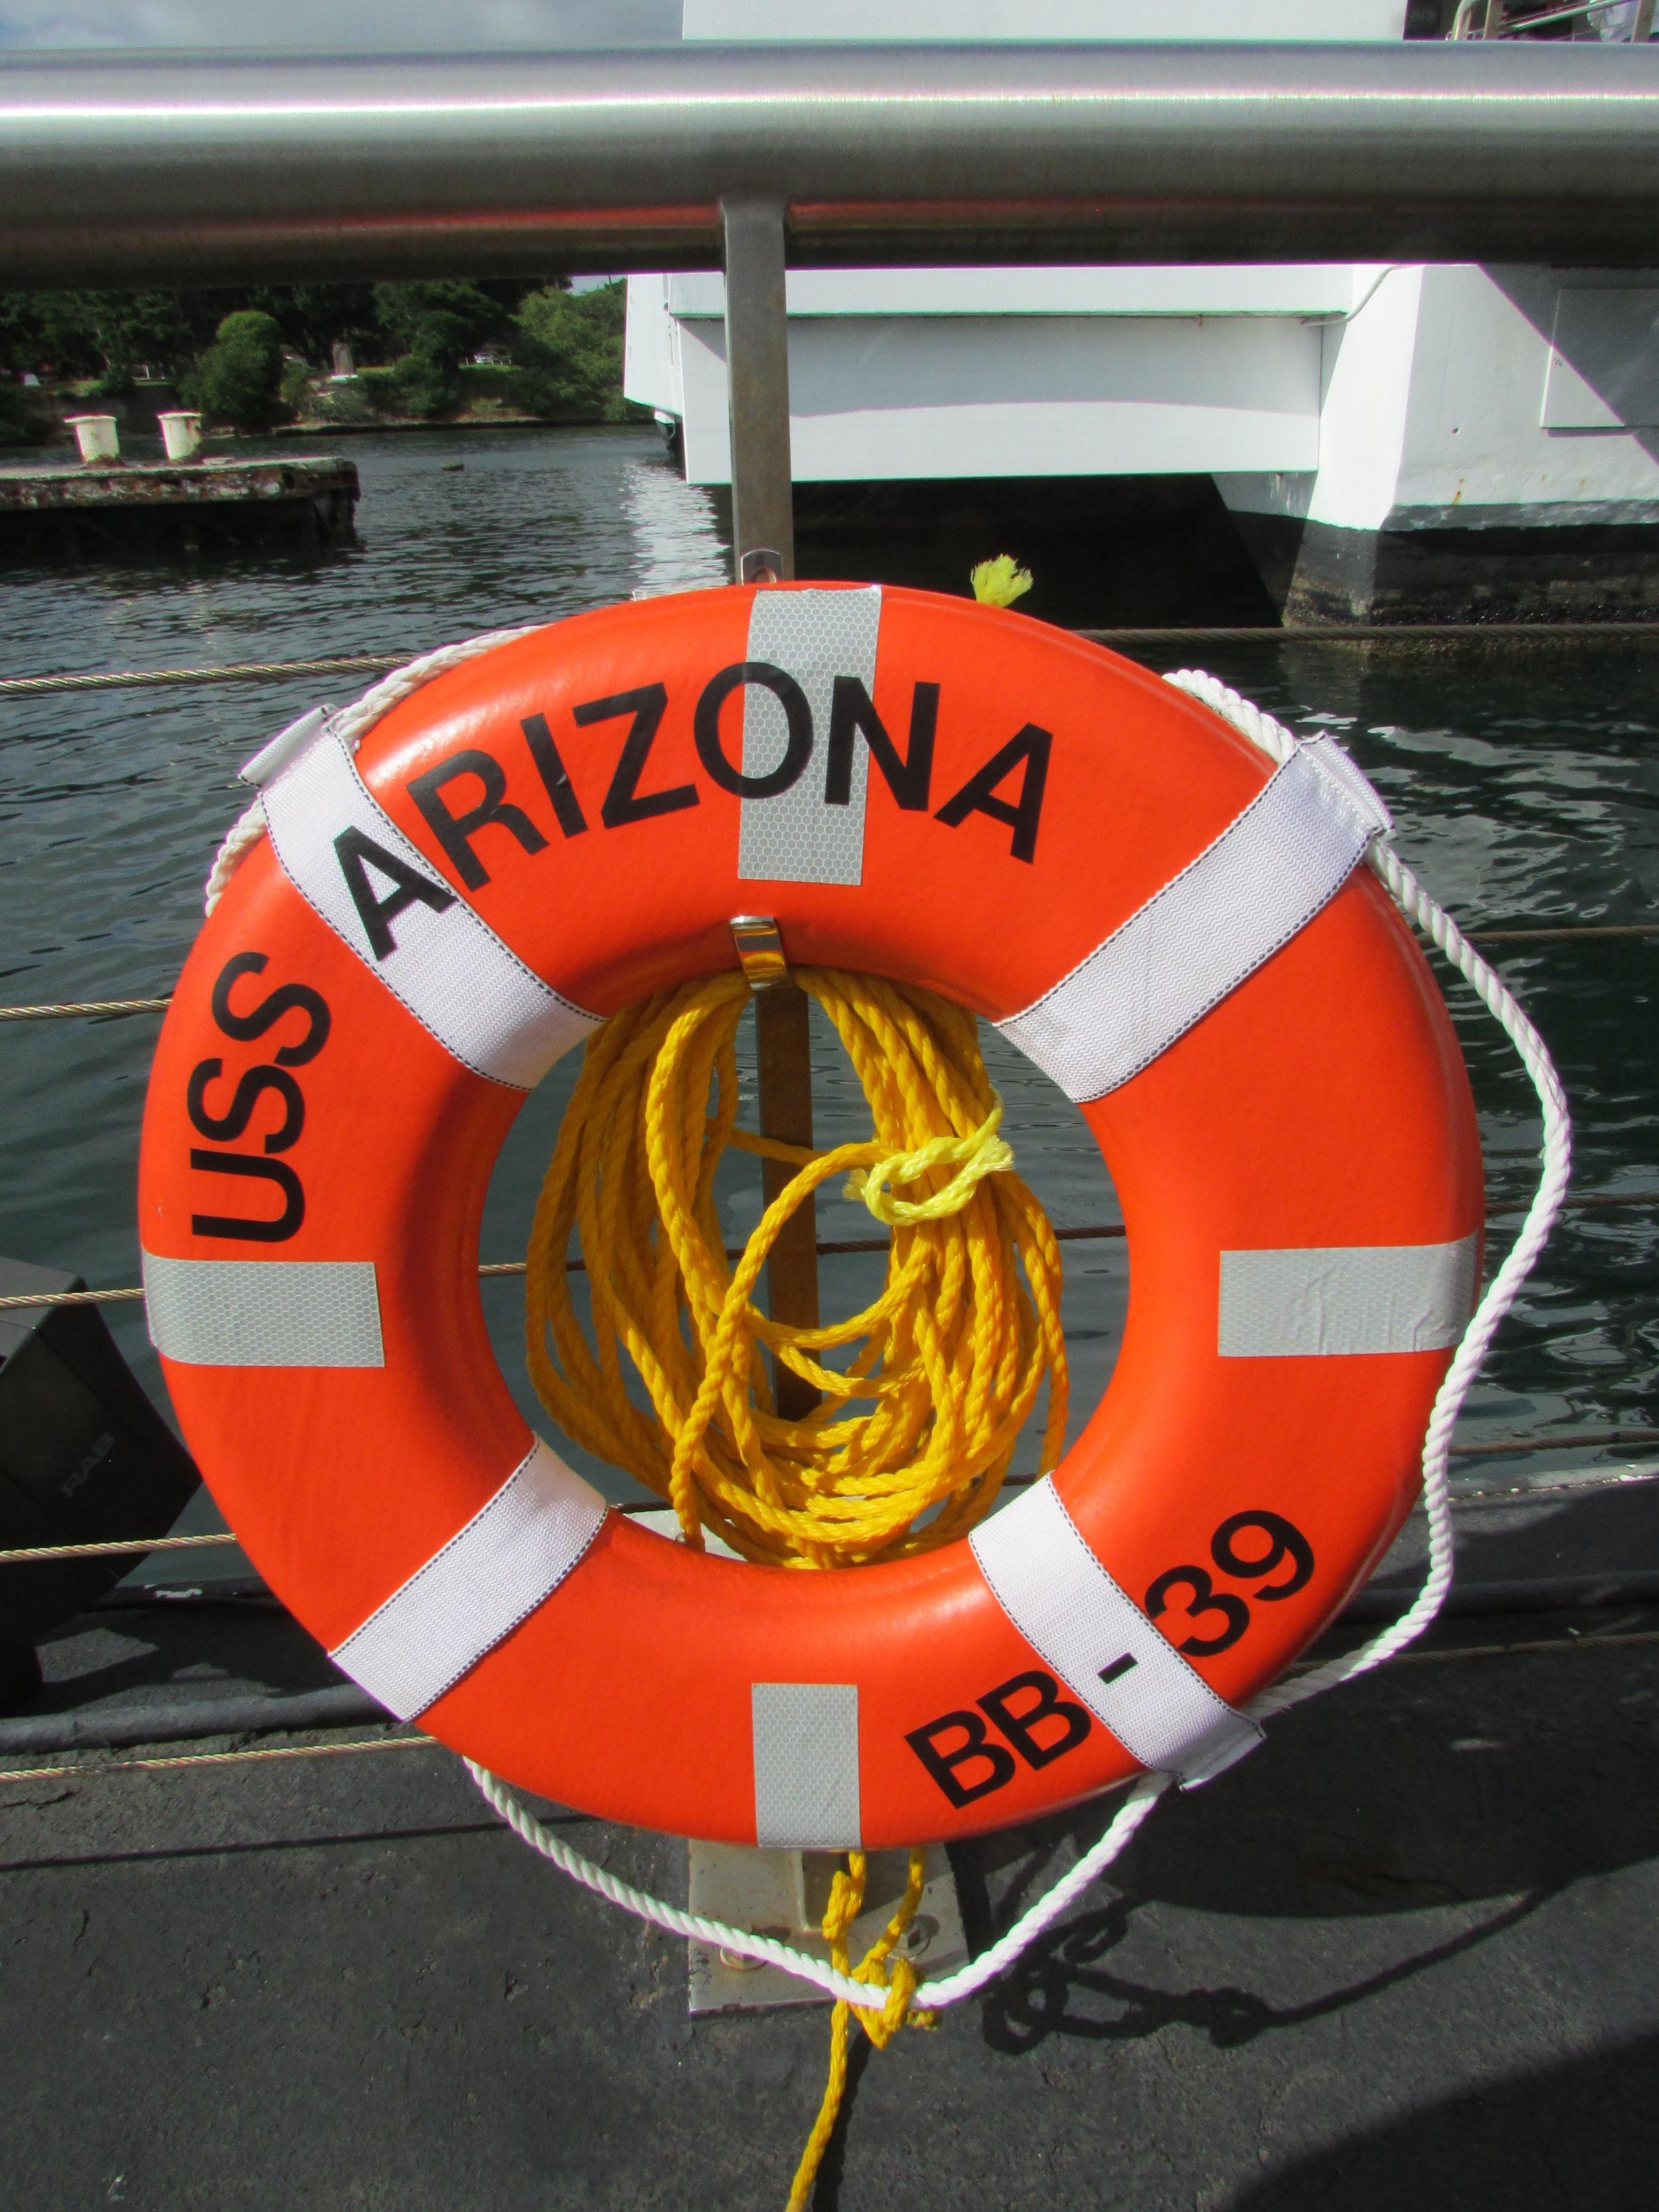 Visiting the USS Arizona in Pearl Harbor